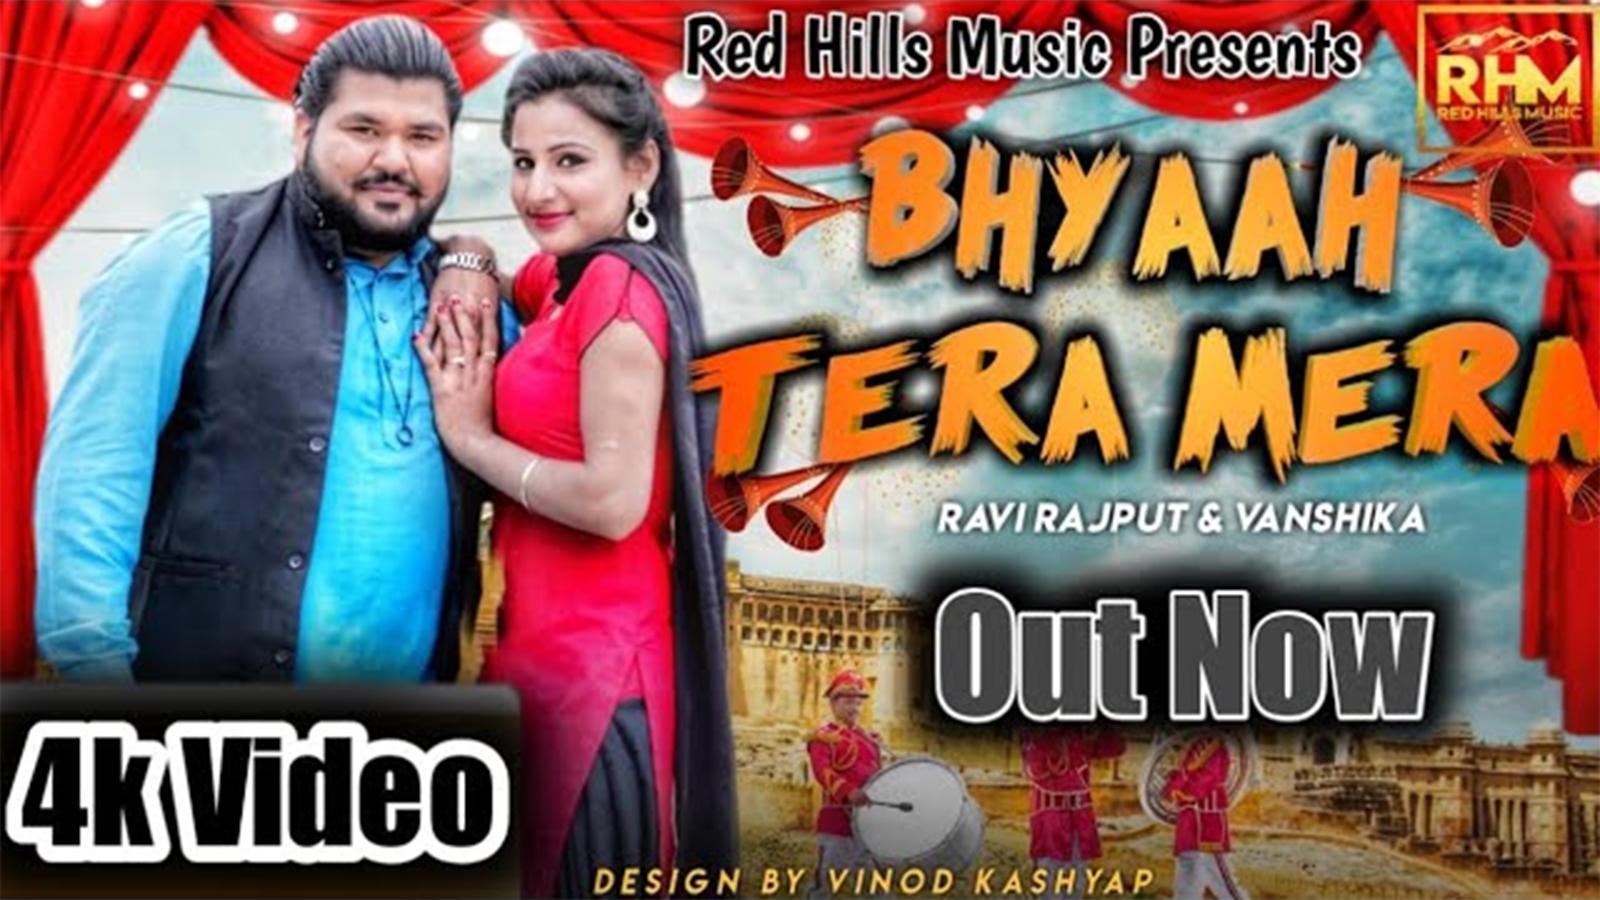 Haryanvi Song Byaah Tera Mera Sung By Sharwan Pabra